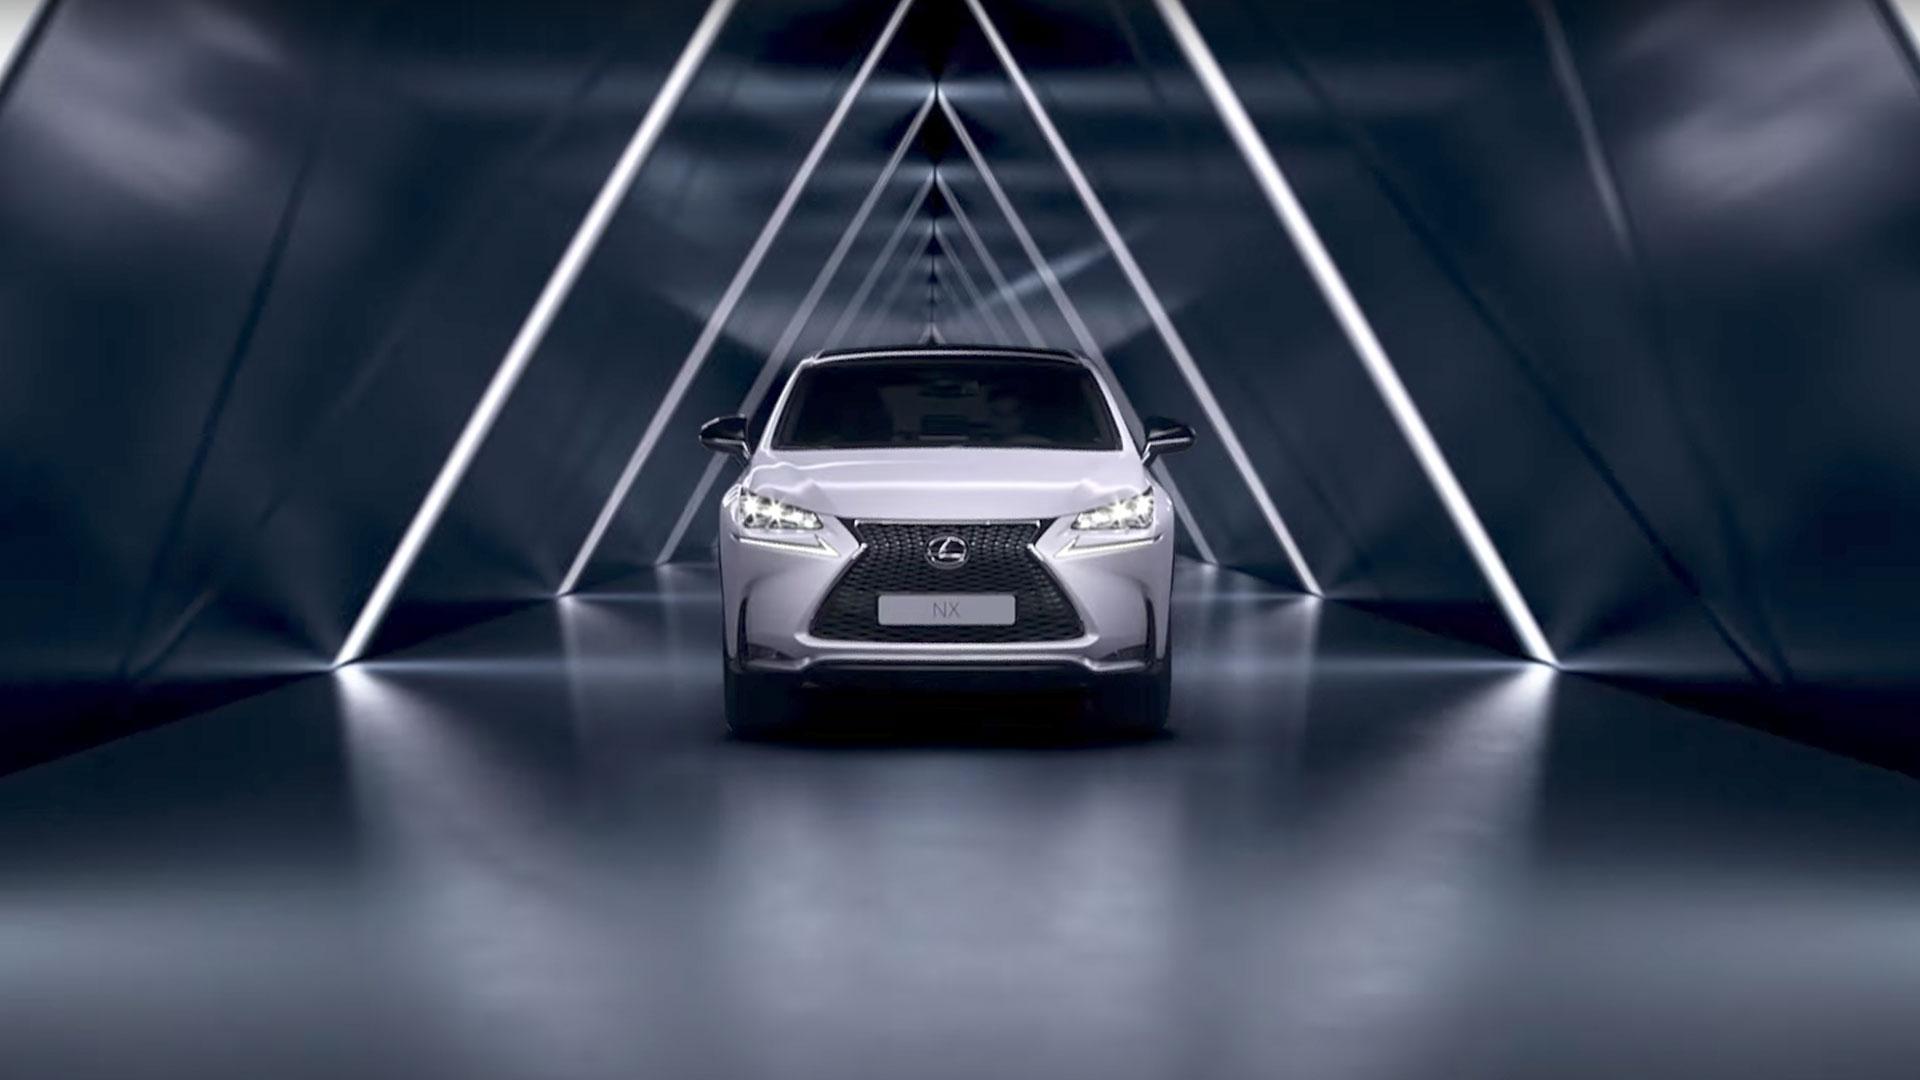 2017 lexus nx 300h driving highlights